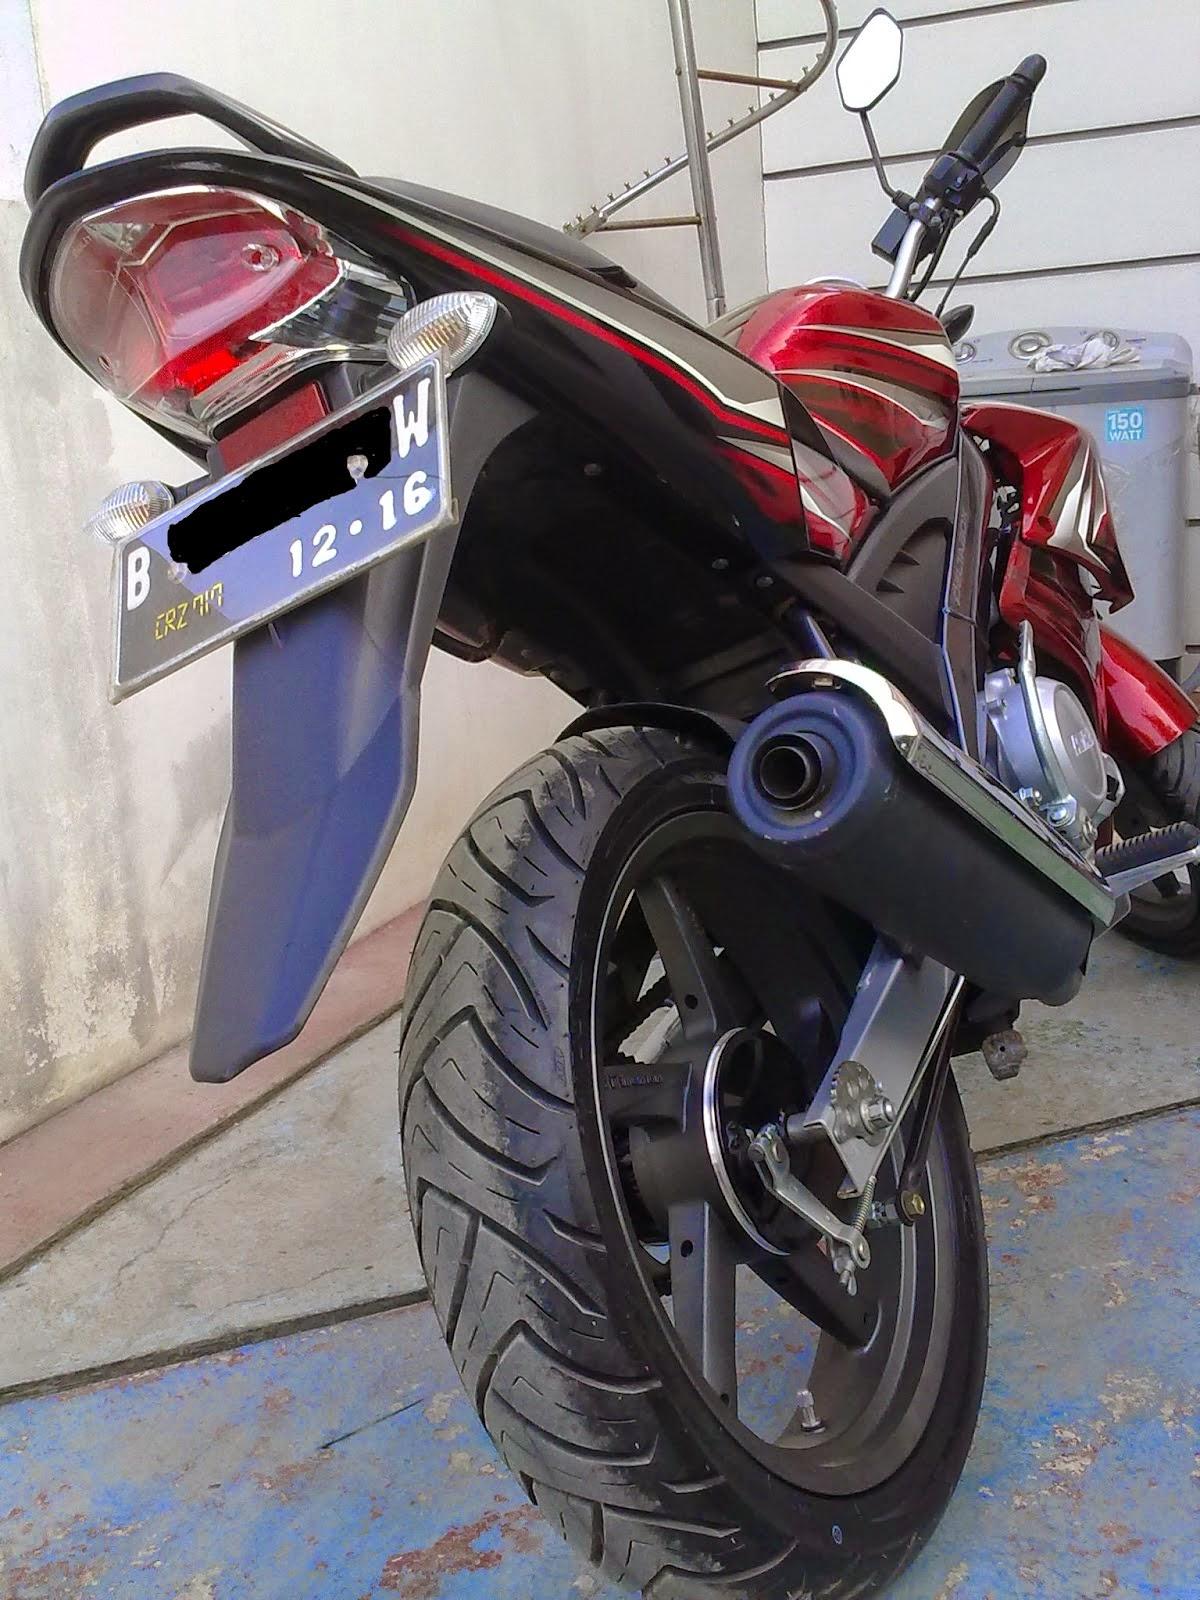 Modifikasi Vario 150 Stang Jepit Galeri Motor Vario